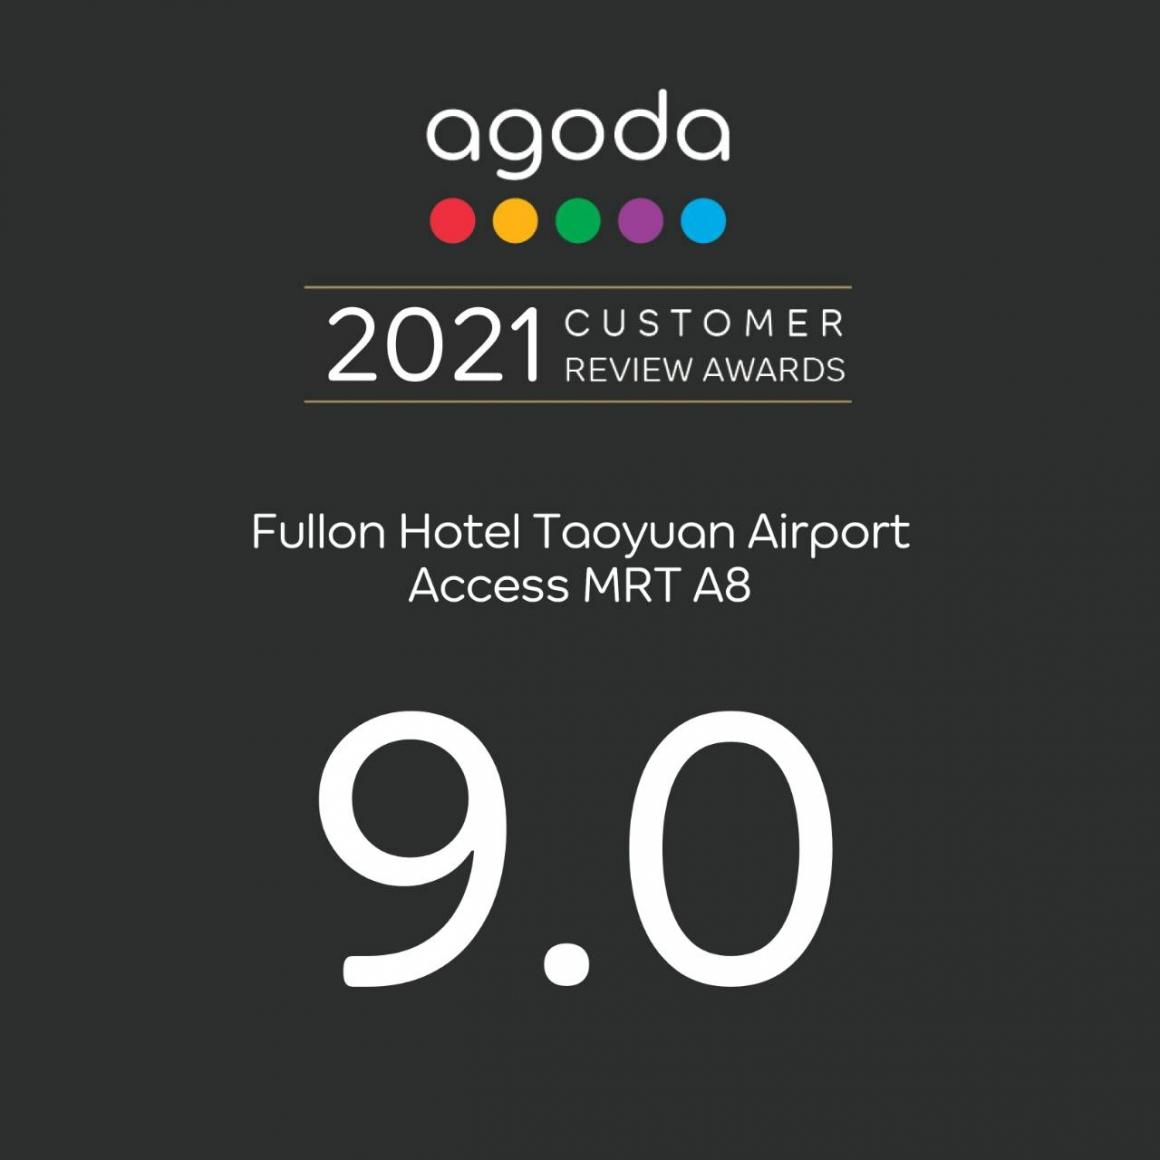 2021 Customer Review Awards 9.0-Agoda